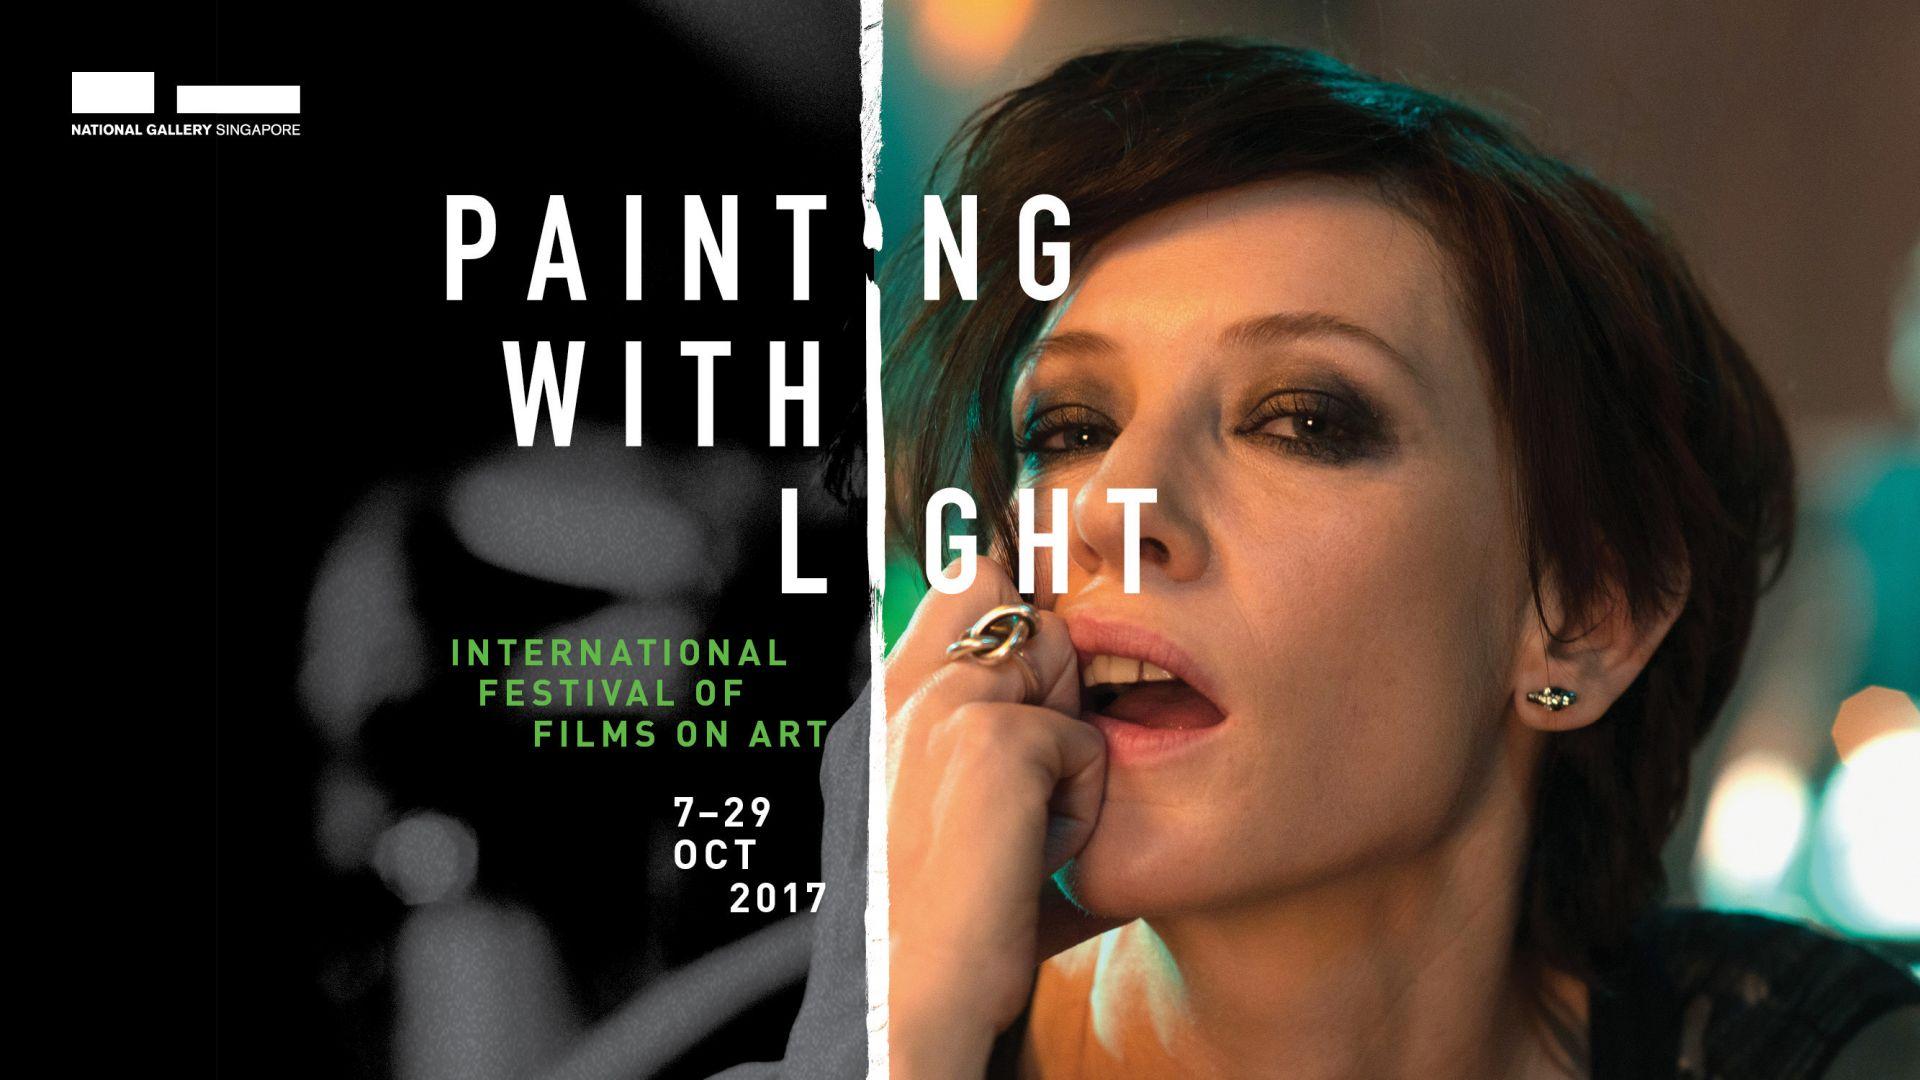 Painting with Light: International Festival of Films on Art